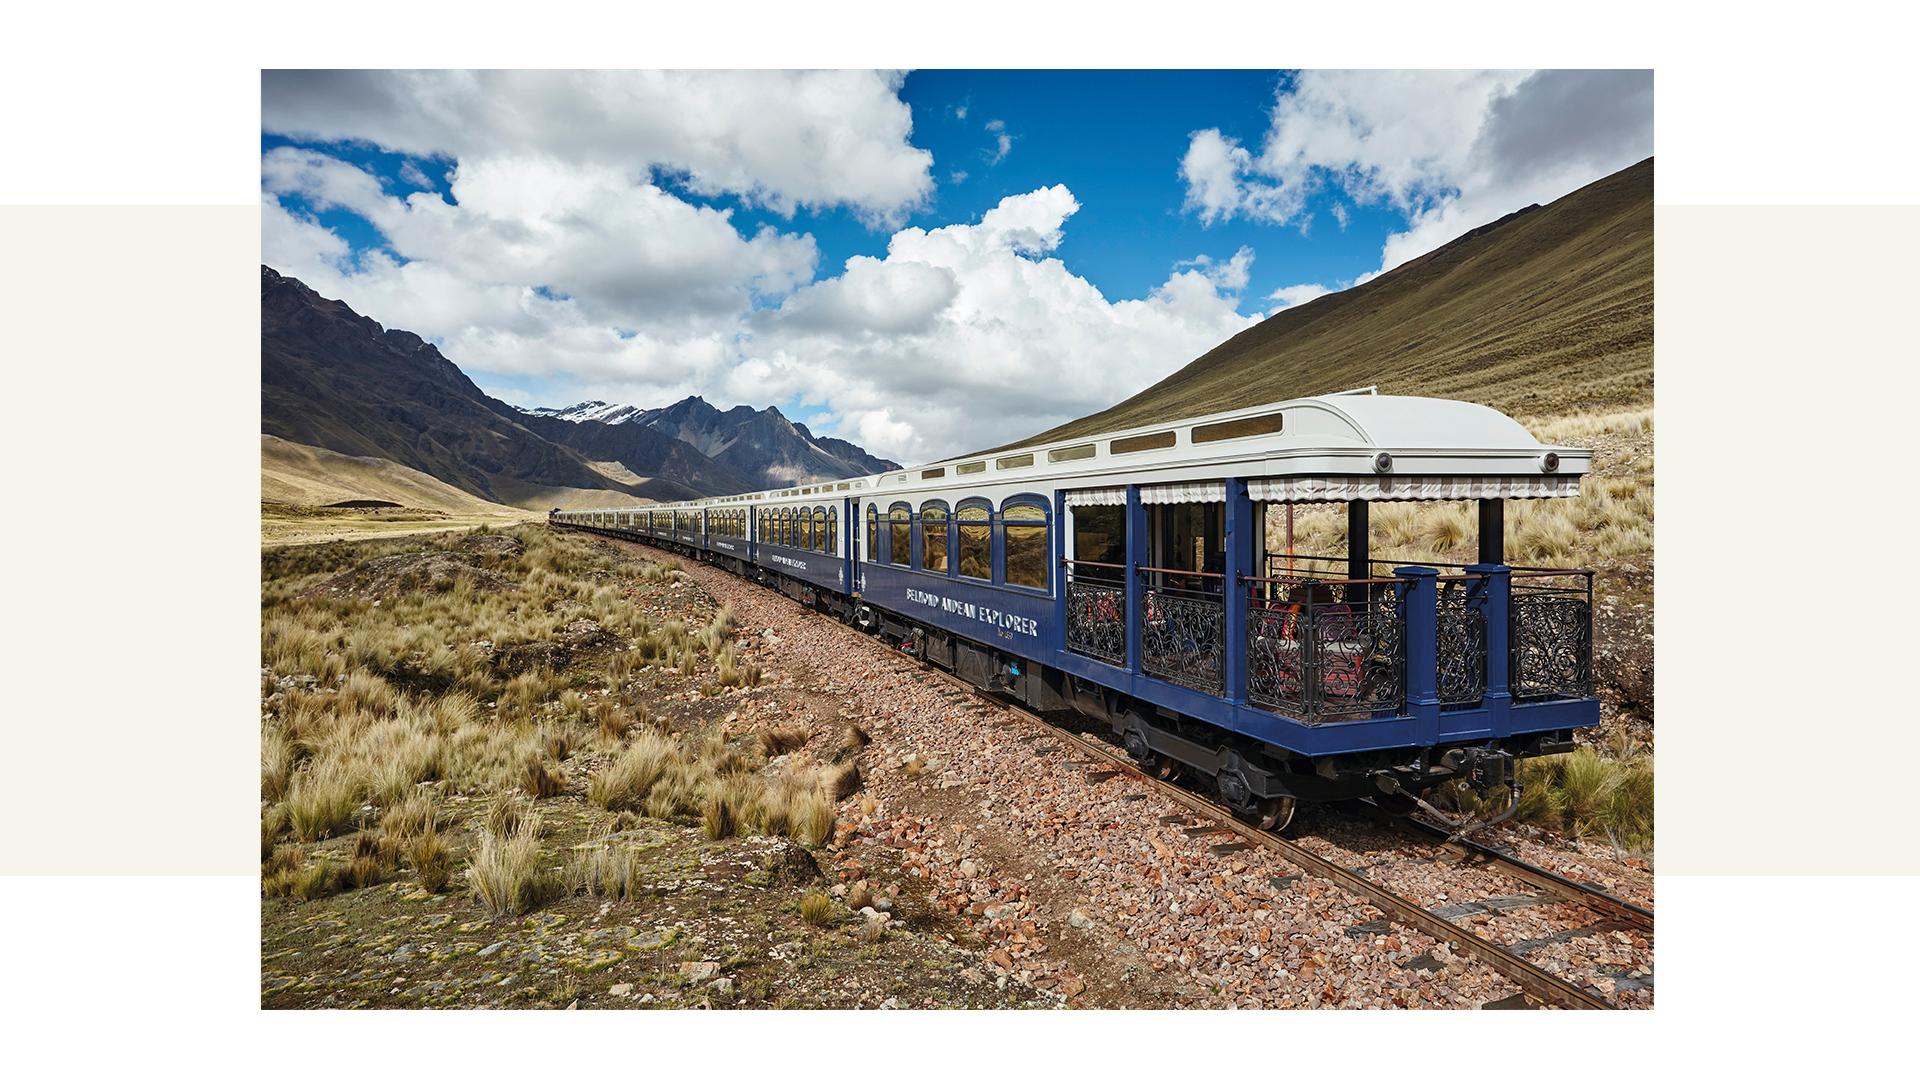 The Belmond Andean Explorer